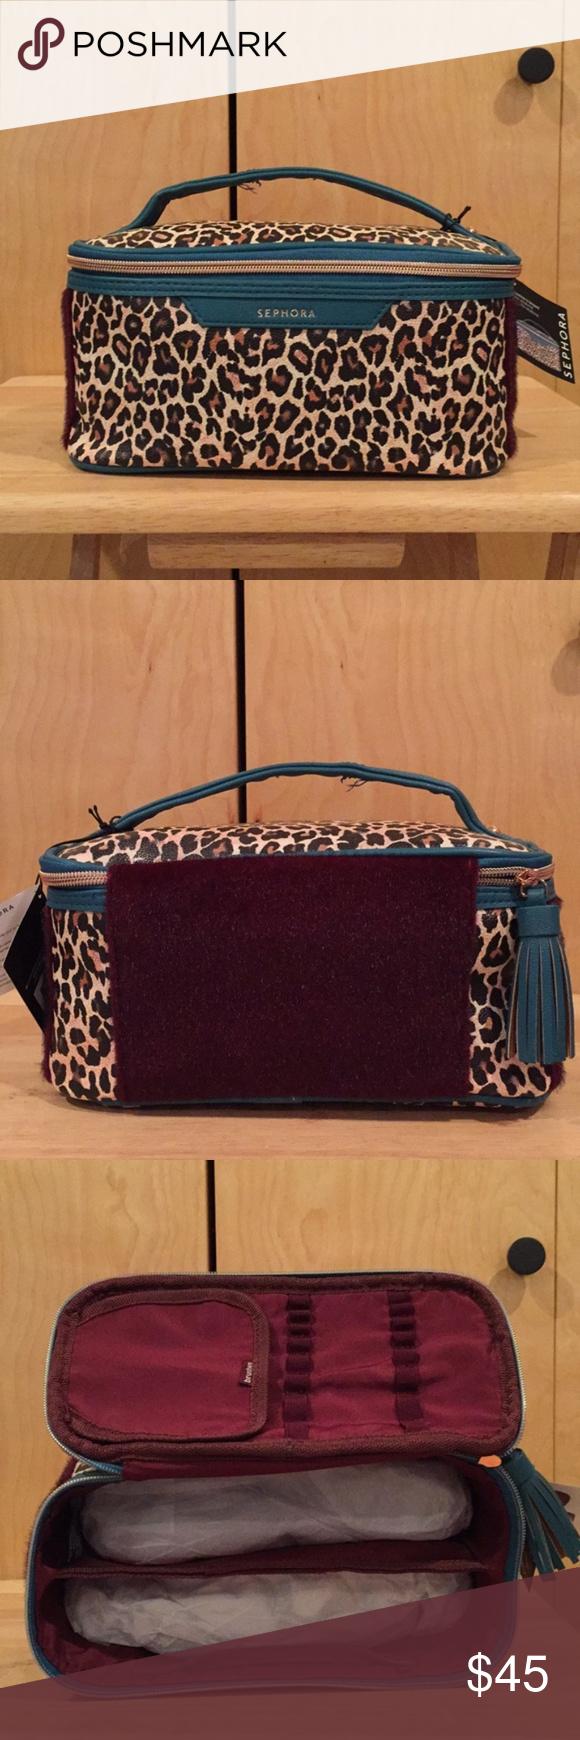 Sephora license to leopard vacationer makeup bag Bags